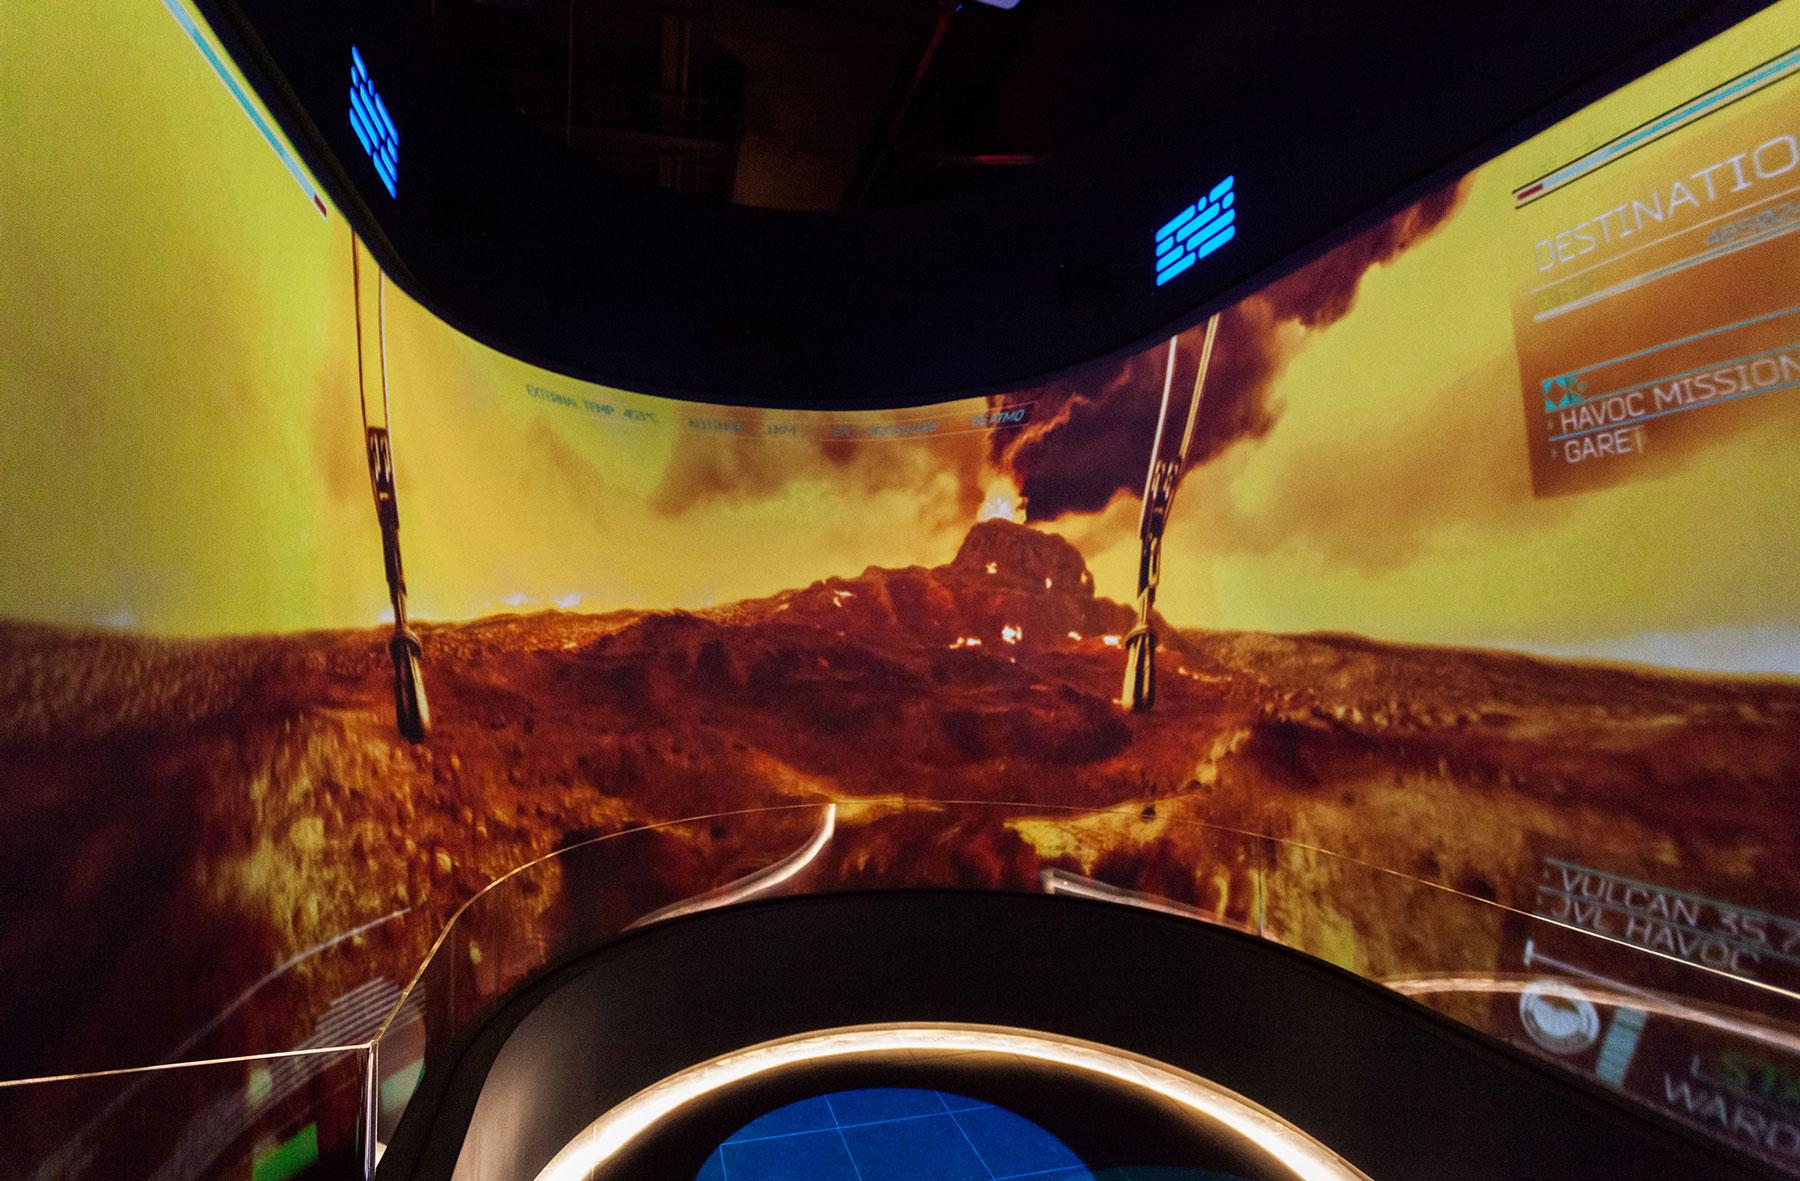 04-frontpictures.com-NSC-Venus-Destination-1800x1181px.jpg.pagespeed.ce_.vO-DcPi5jr